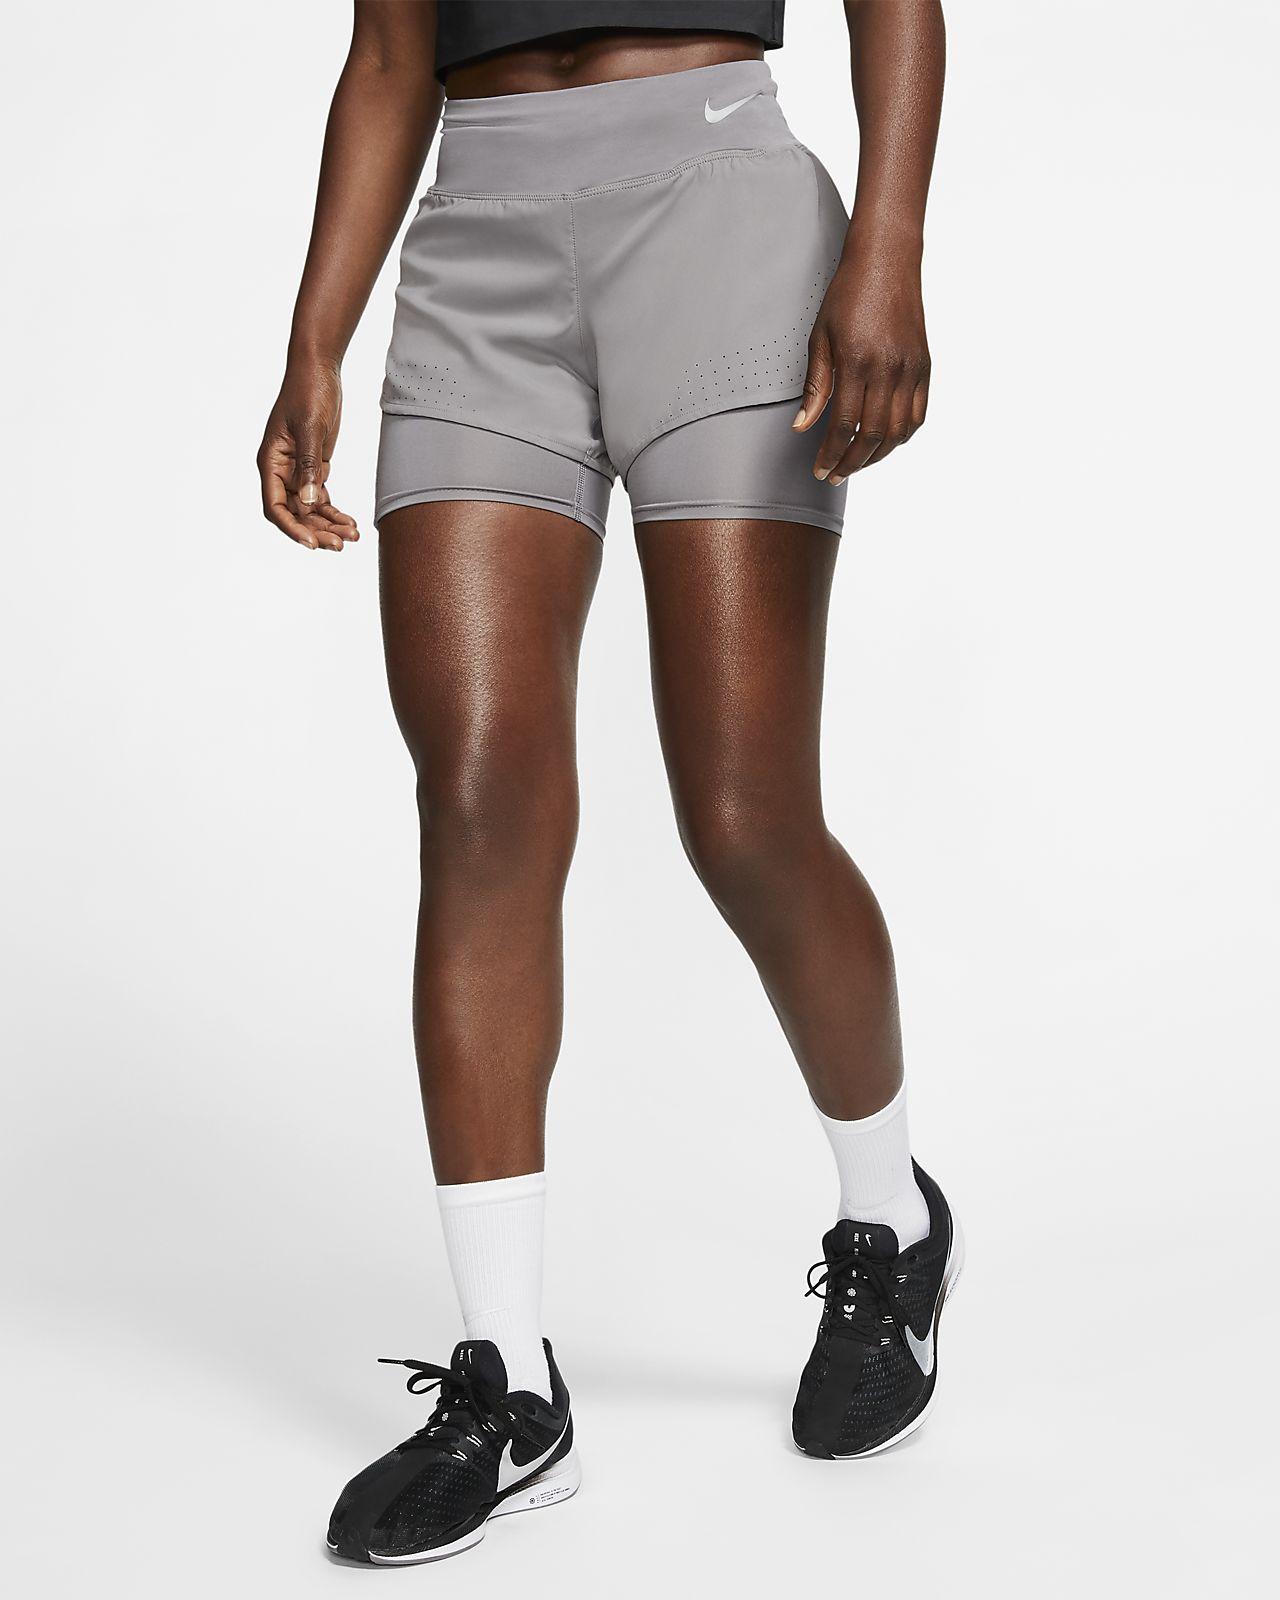 Nike Eclipse Women's 2 in 1 Running Shorts